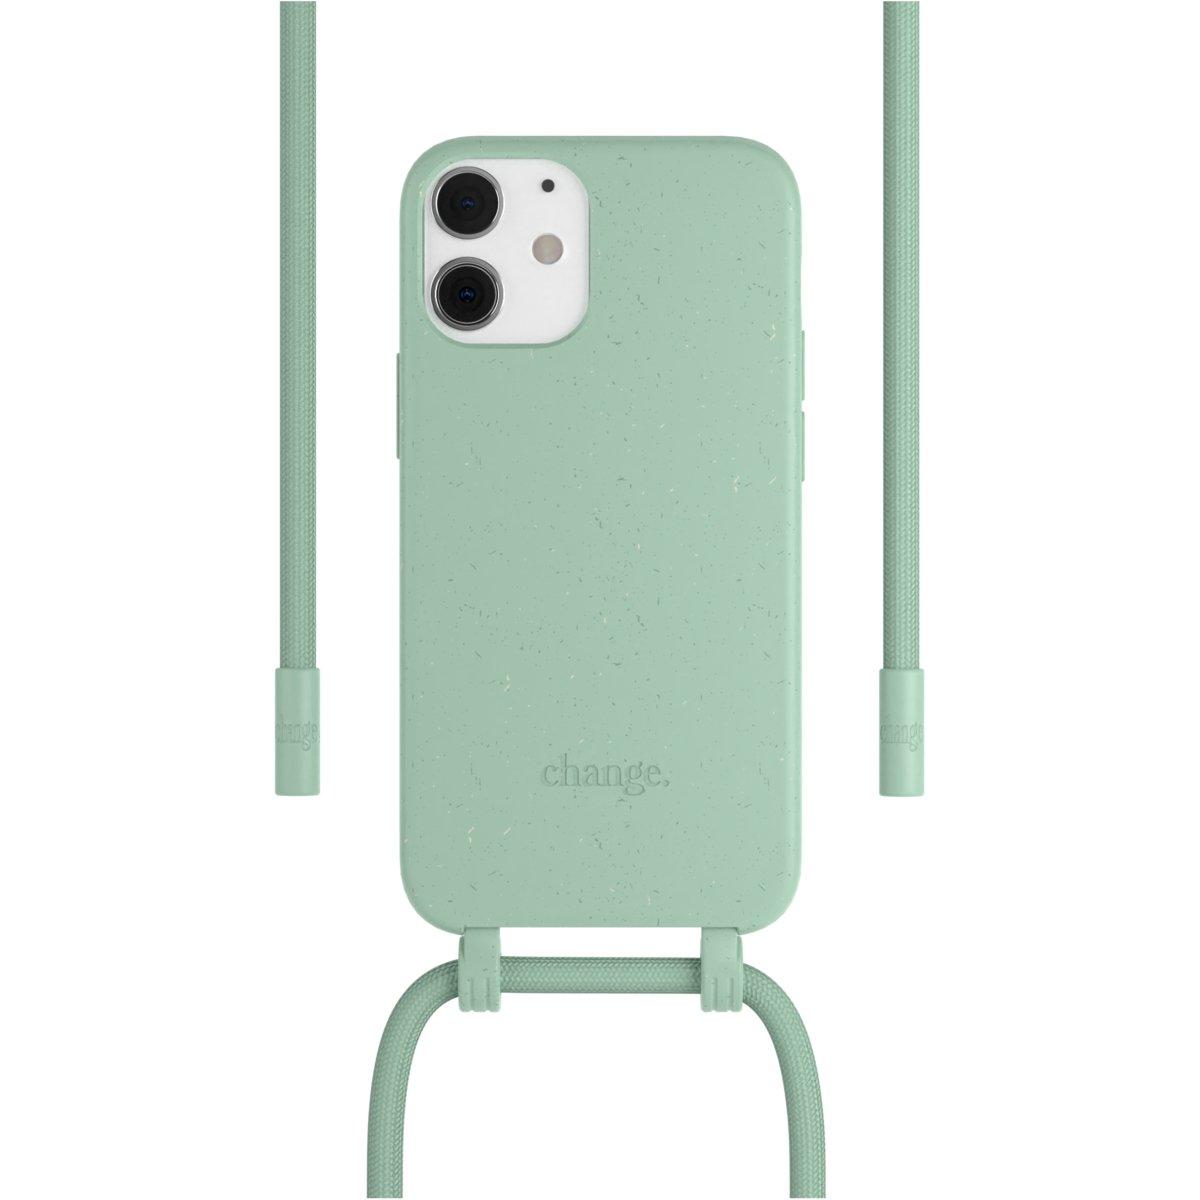 Woodcessories Change Case AM iPhone 12 Mini - mint